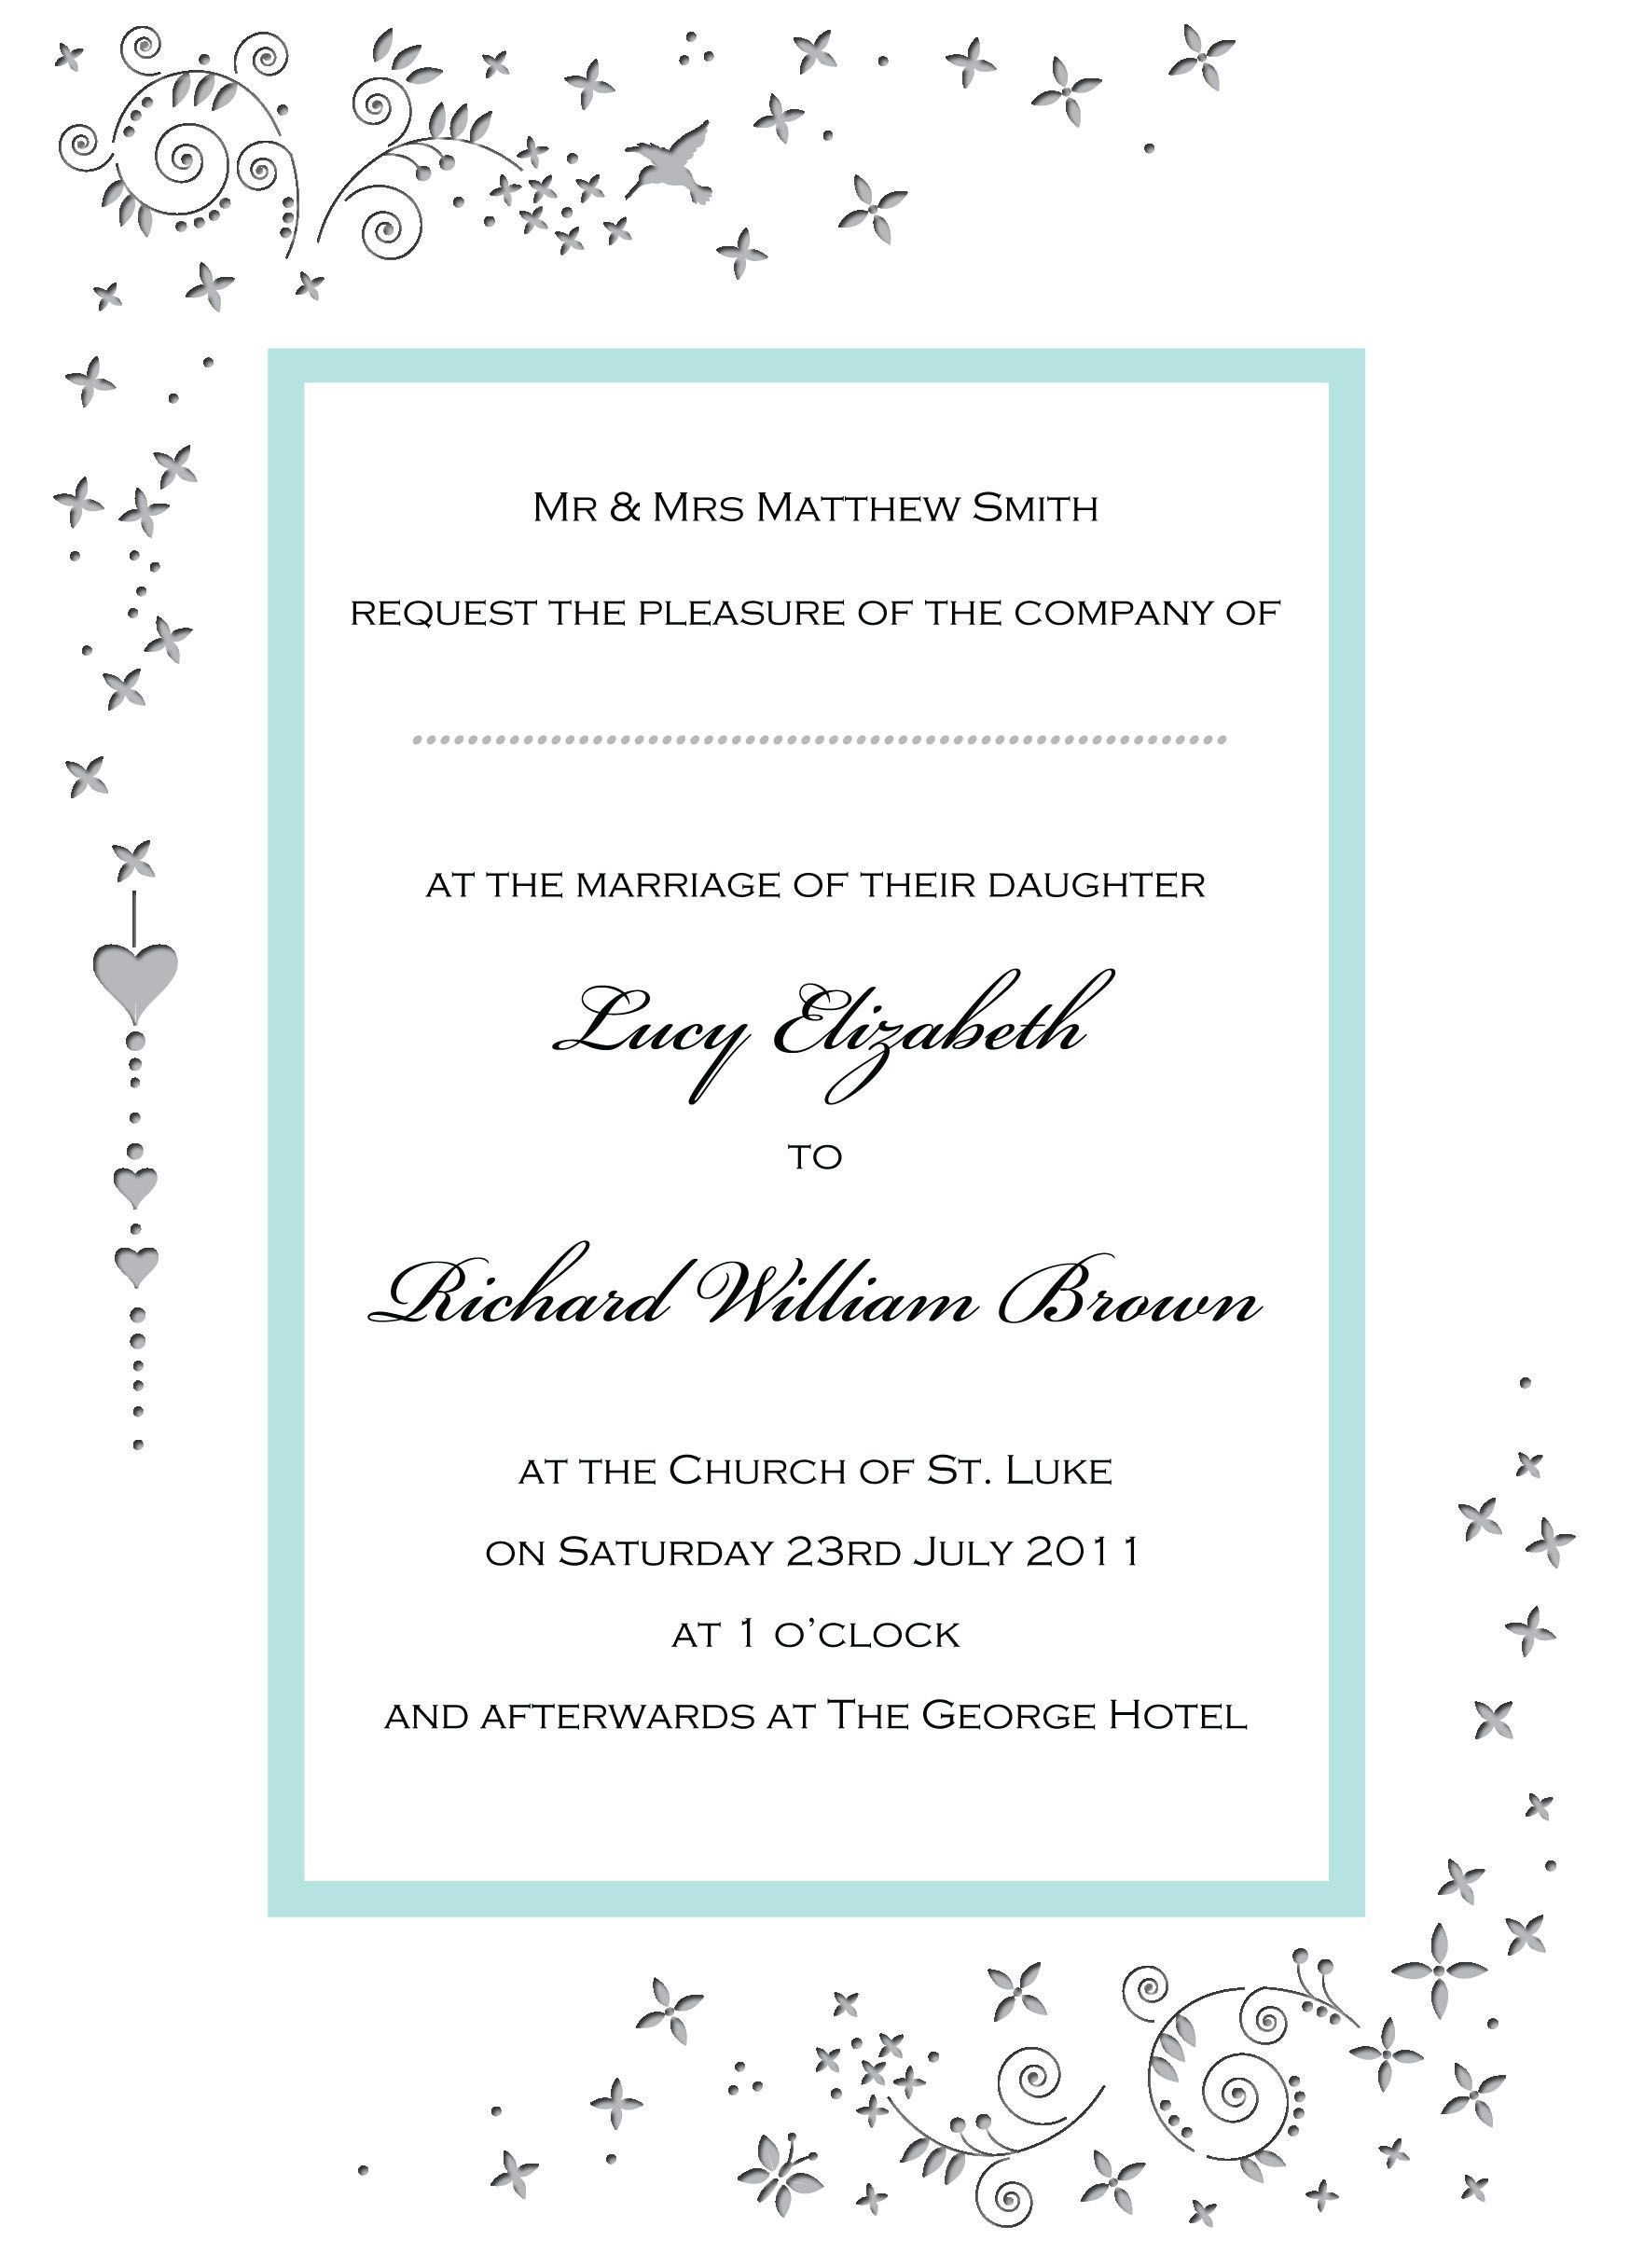 001 Rare Microsoft Word Invitation Template Image  Templates Baby Shower Free Graduation Announcement For WeddingFull